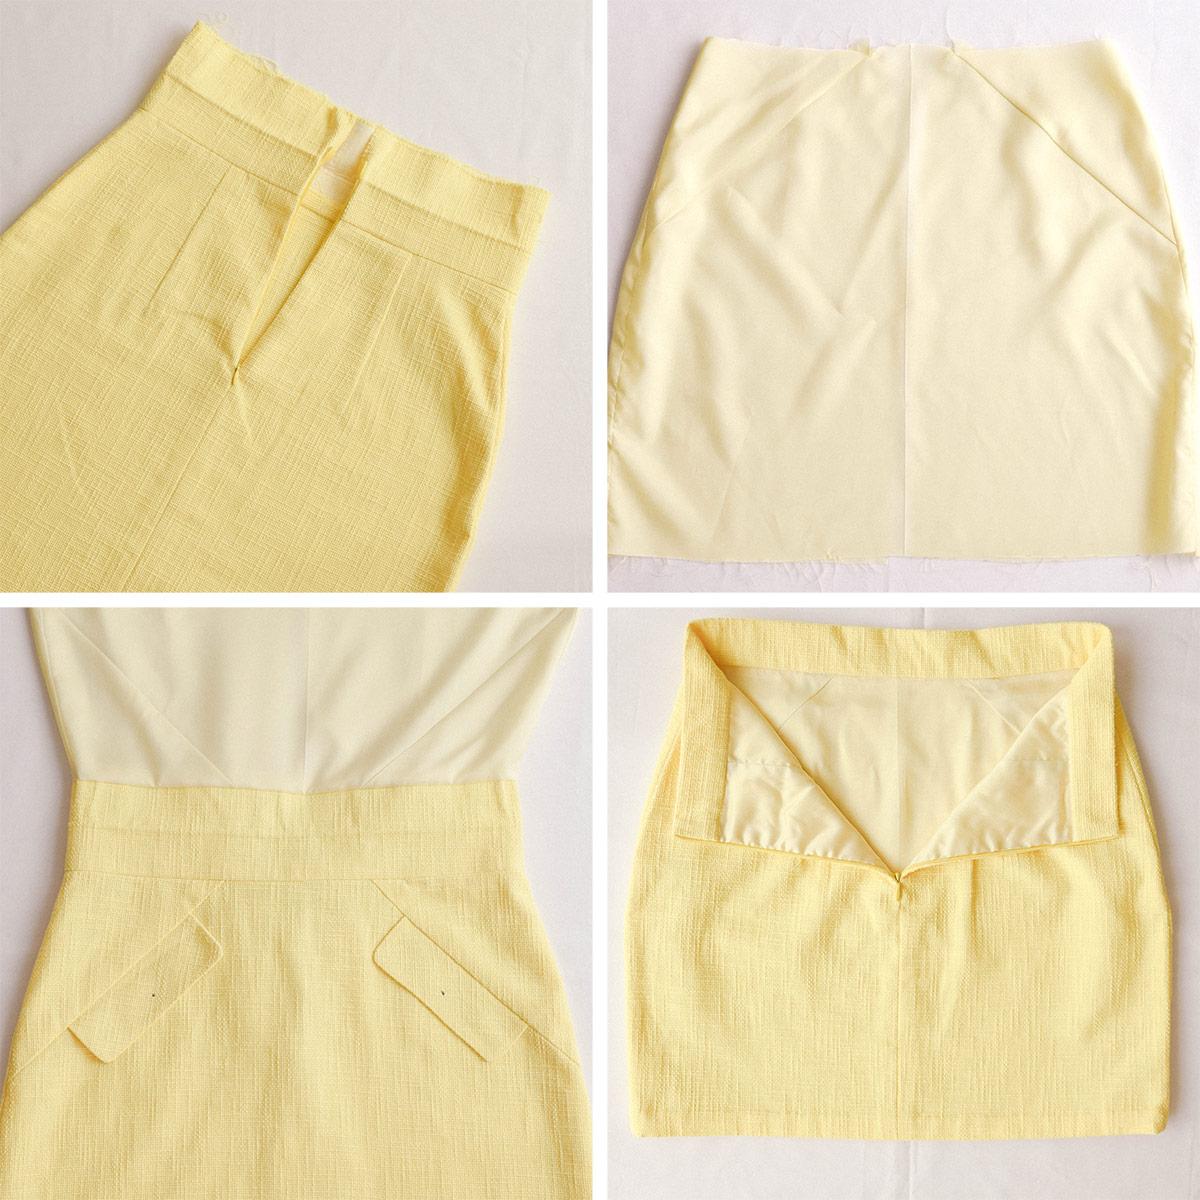 chanel-inspired-skirt-burda-thepetitecat-4